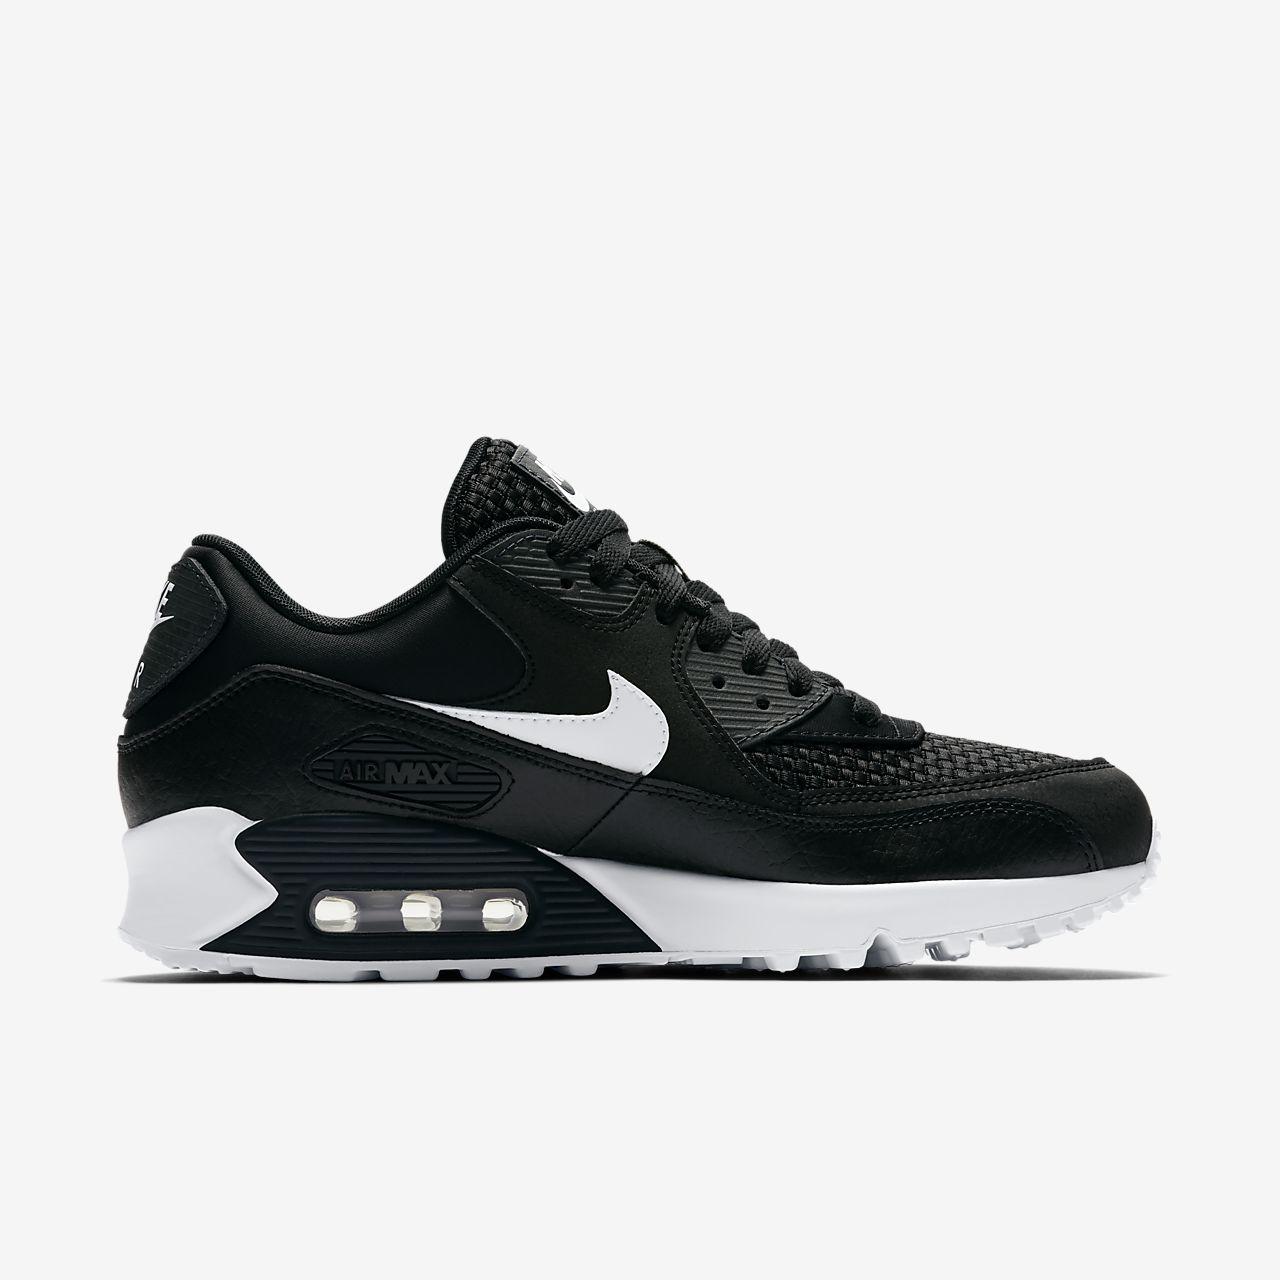 ... Nike Air Max 90 SE Women's Shoe